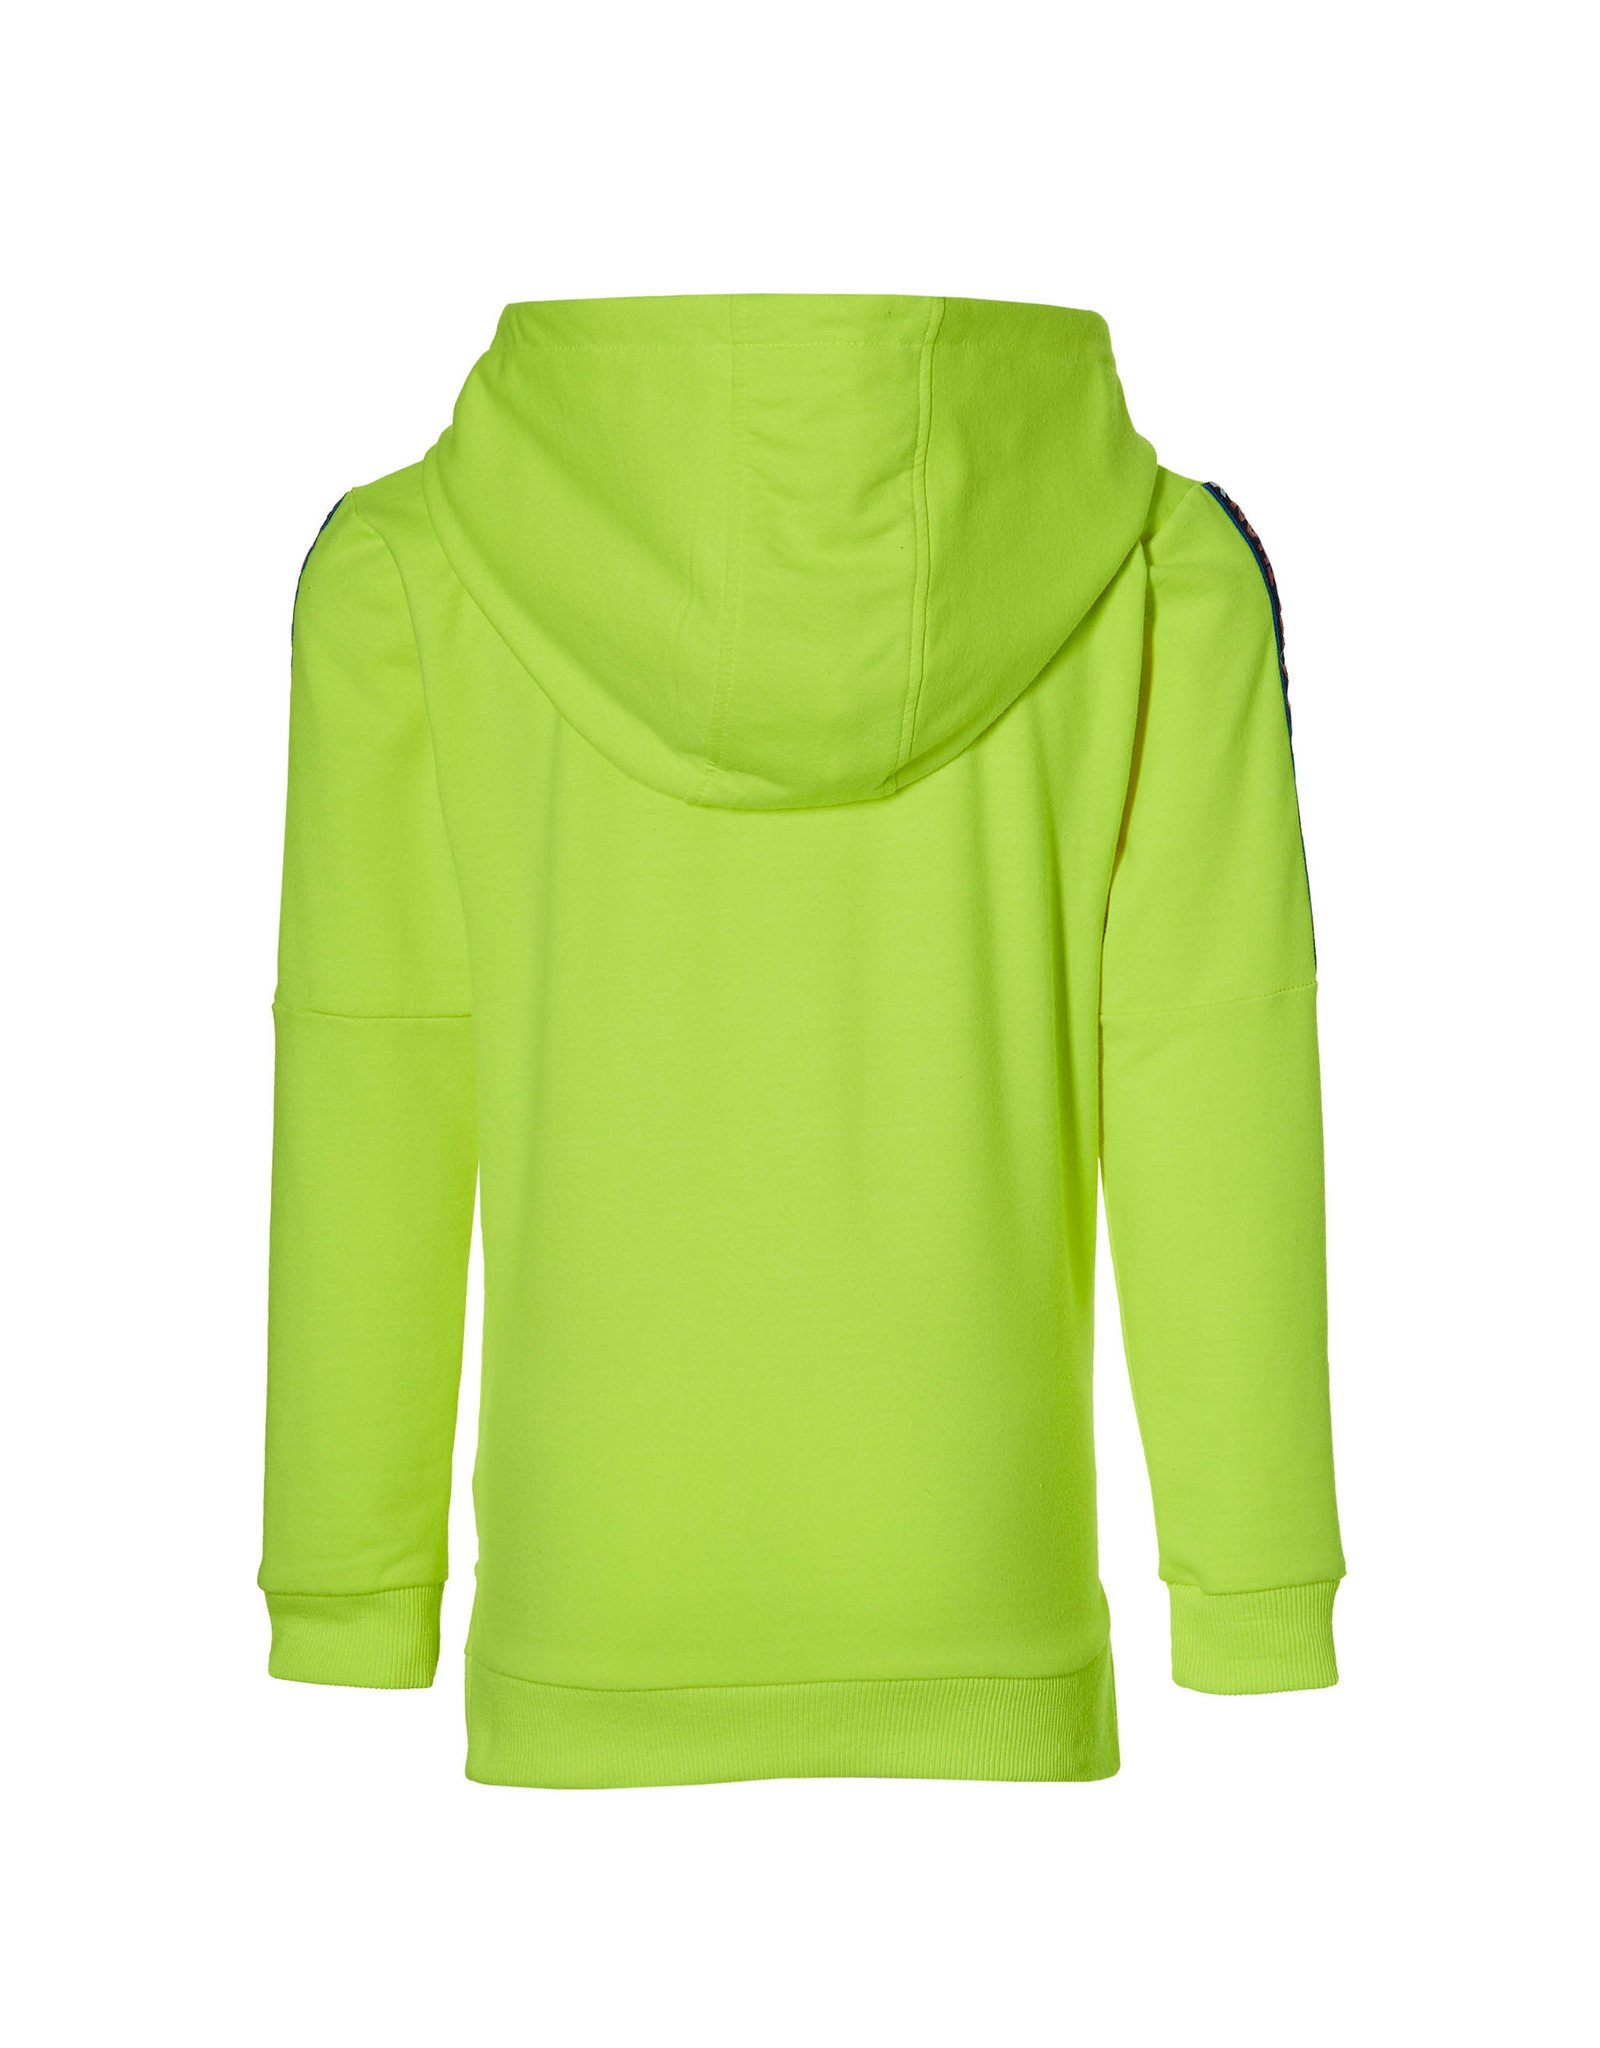 Quapi DANNY W201 Lime Neon